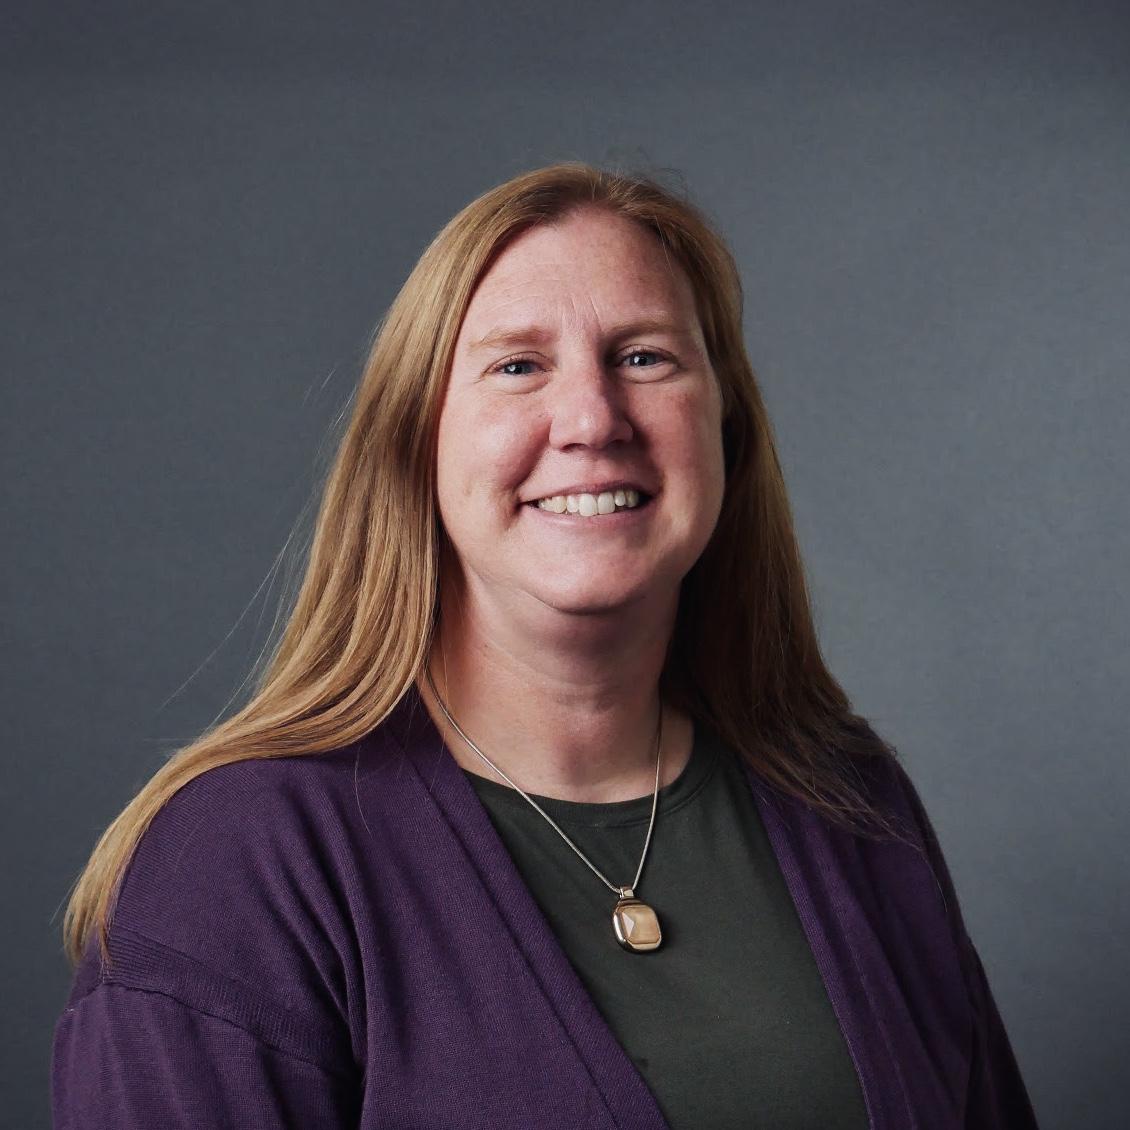 Marcy Martinez - Associate Director